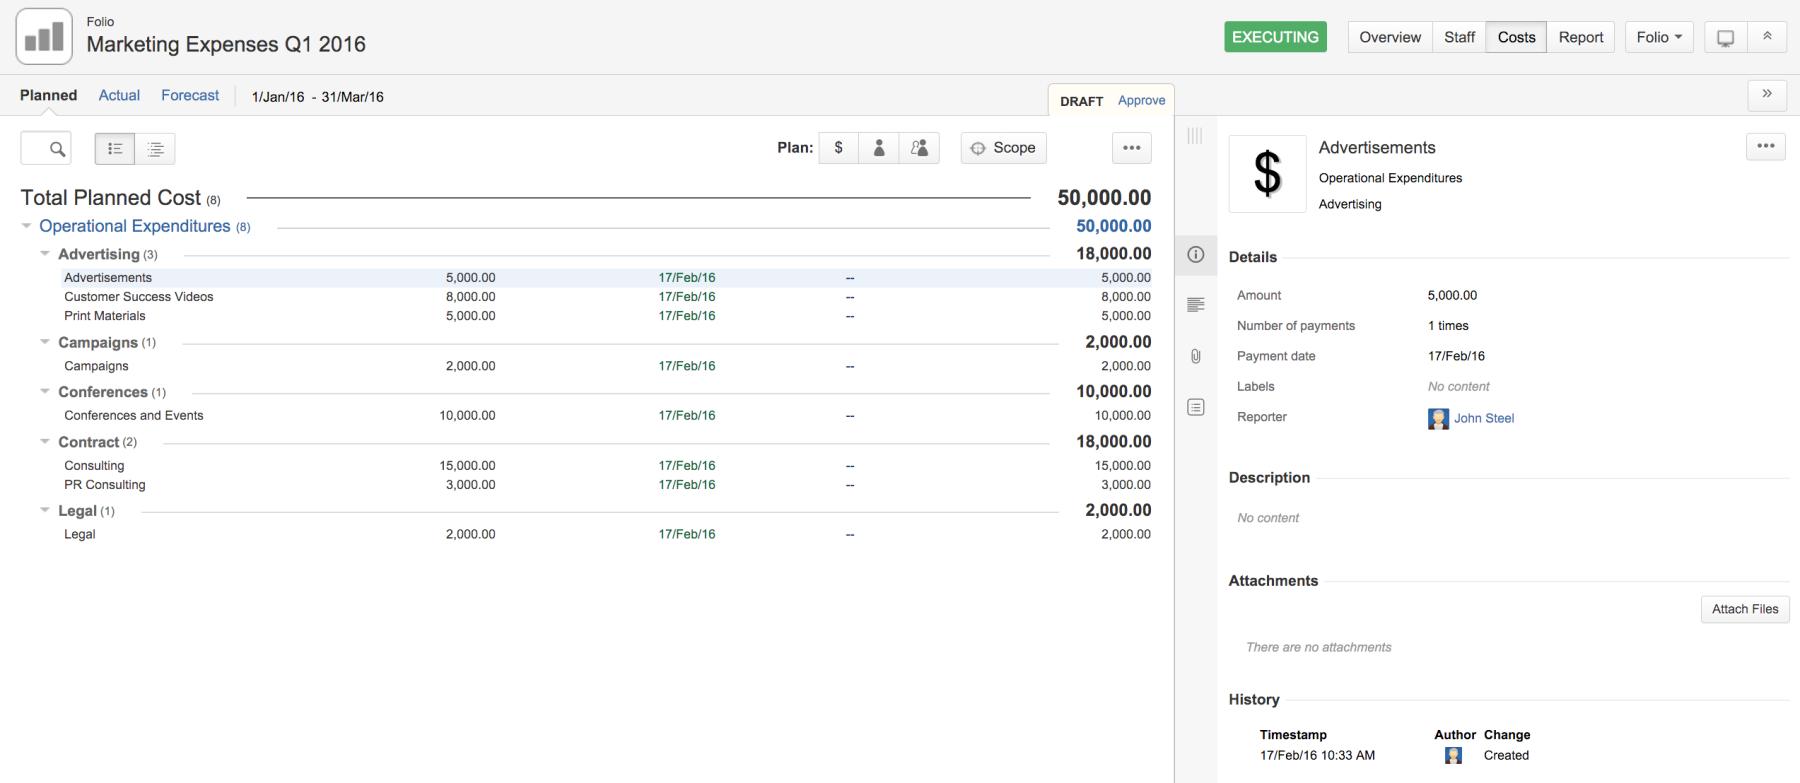 Tempo Folio | Planned Costs Marketing